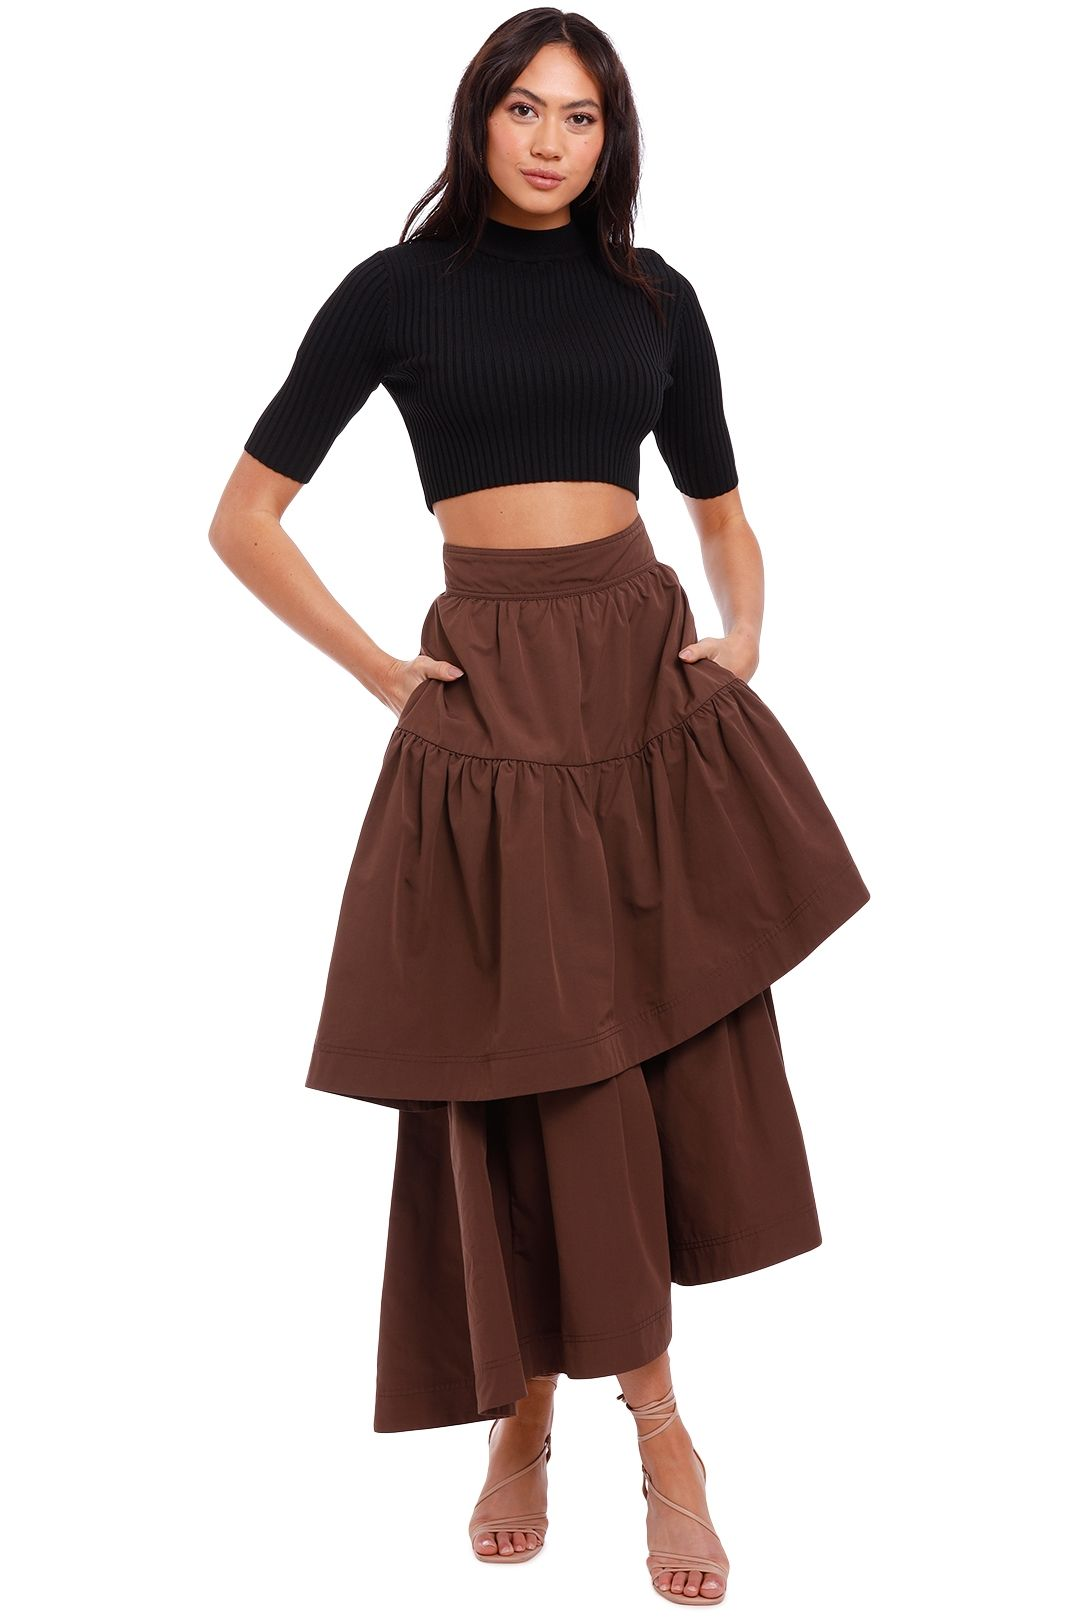 AJE Interlace Midi Skirt brown